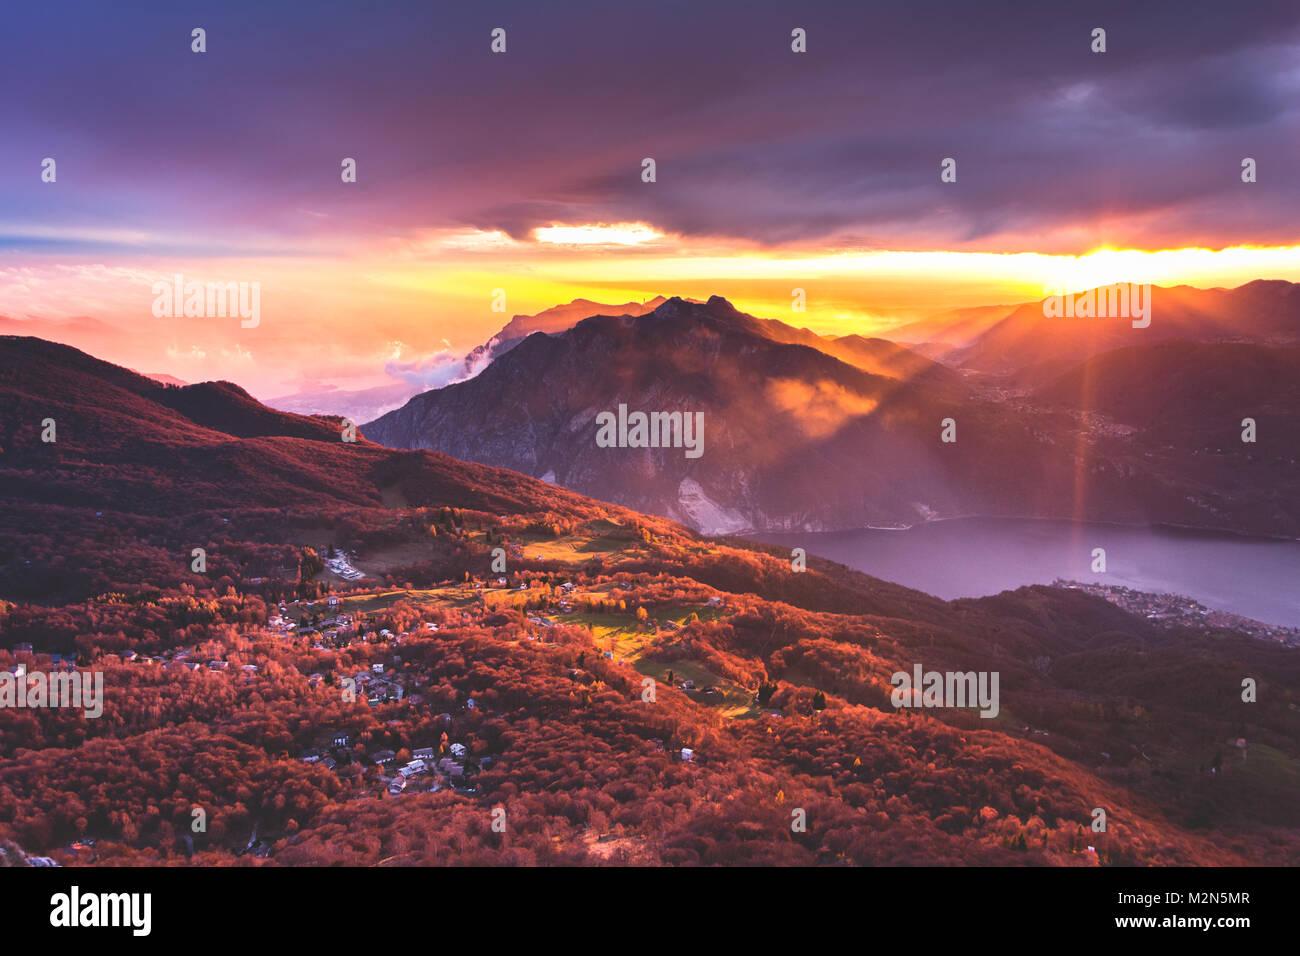 Mountain sunset - Stock Image